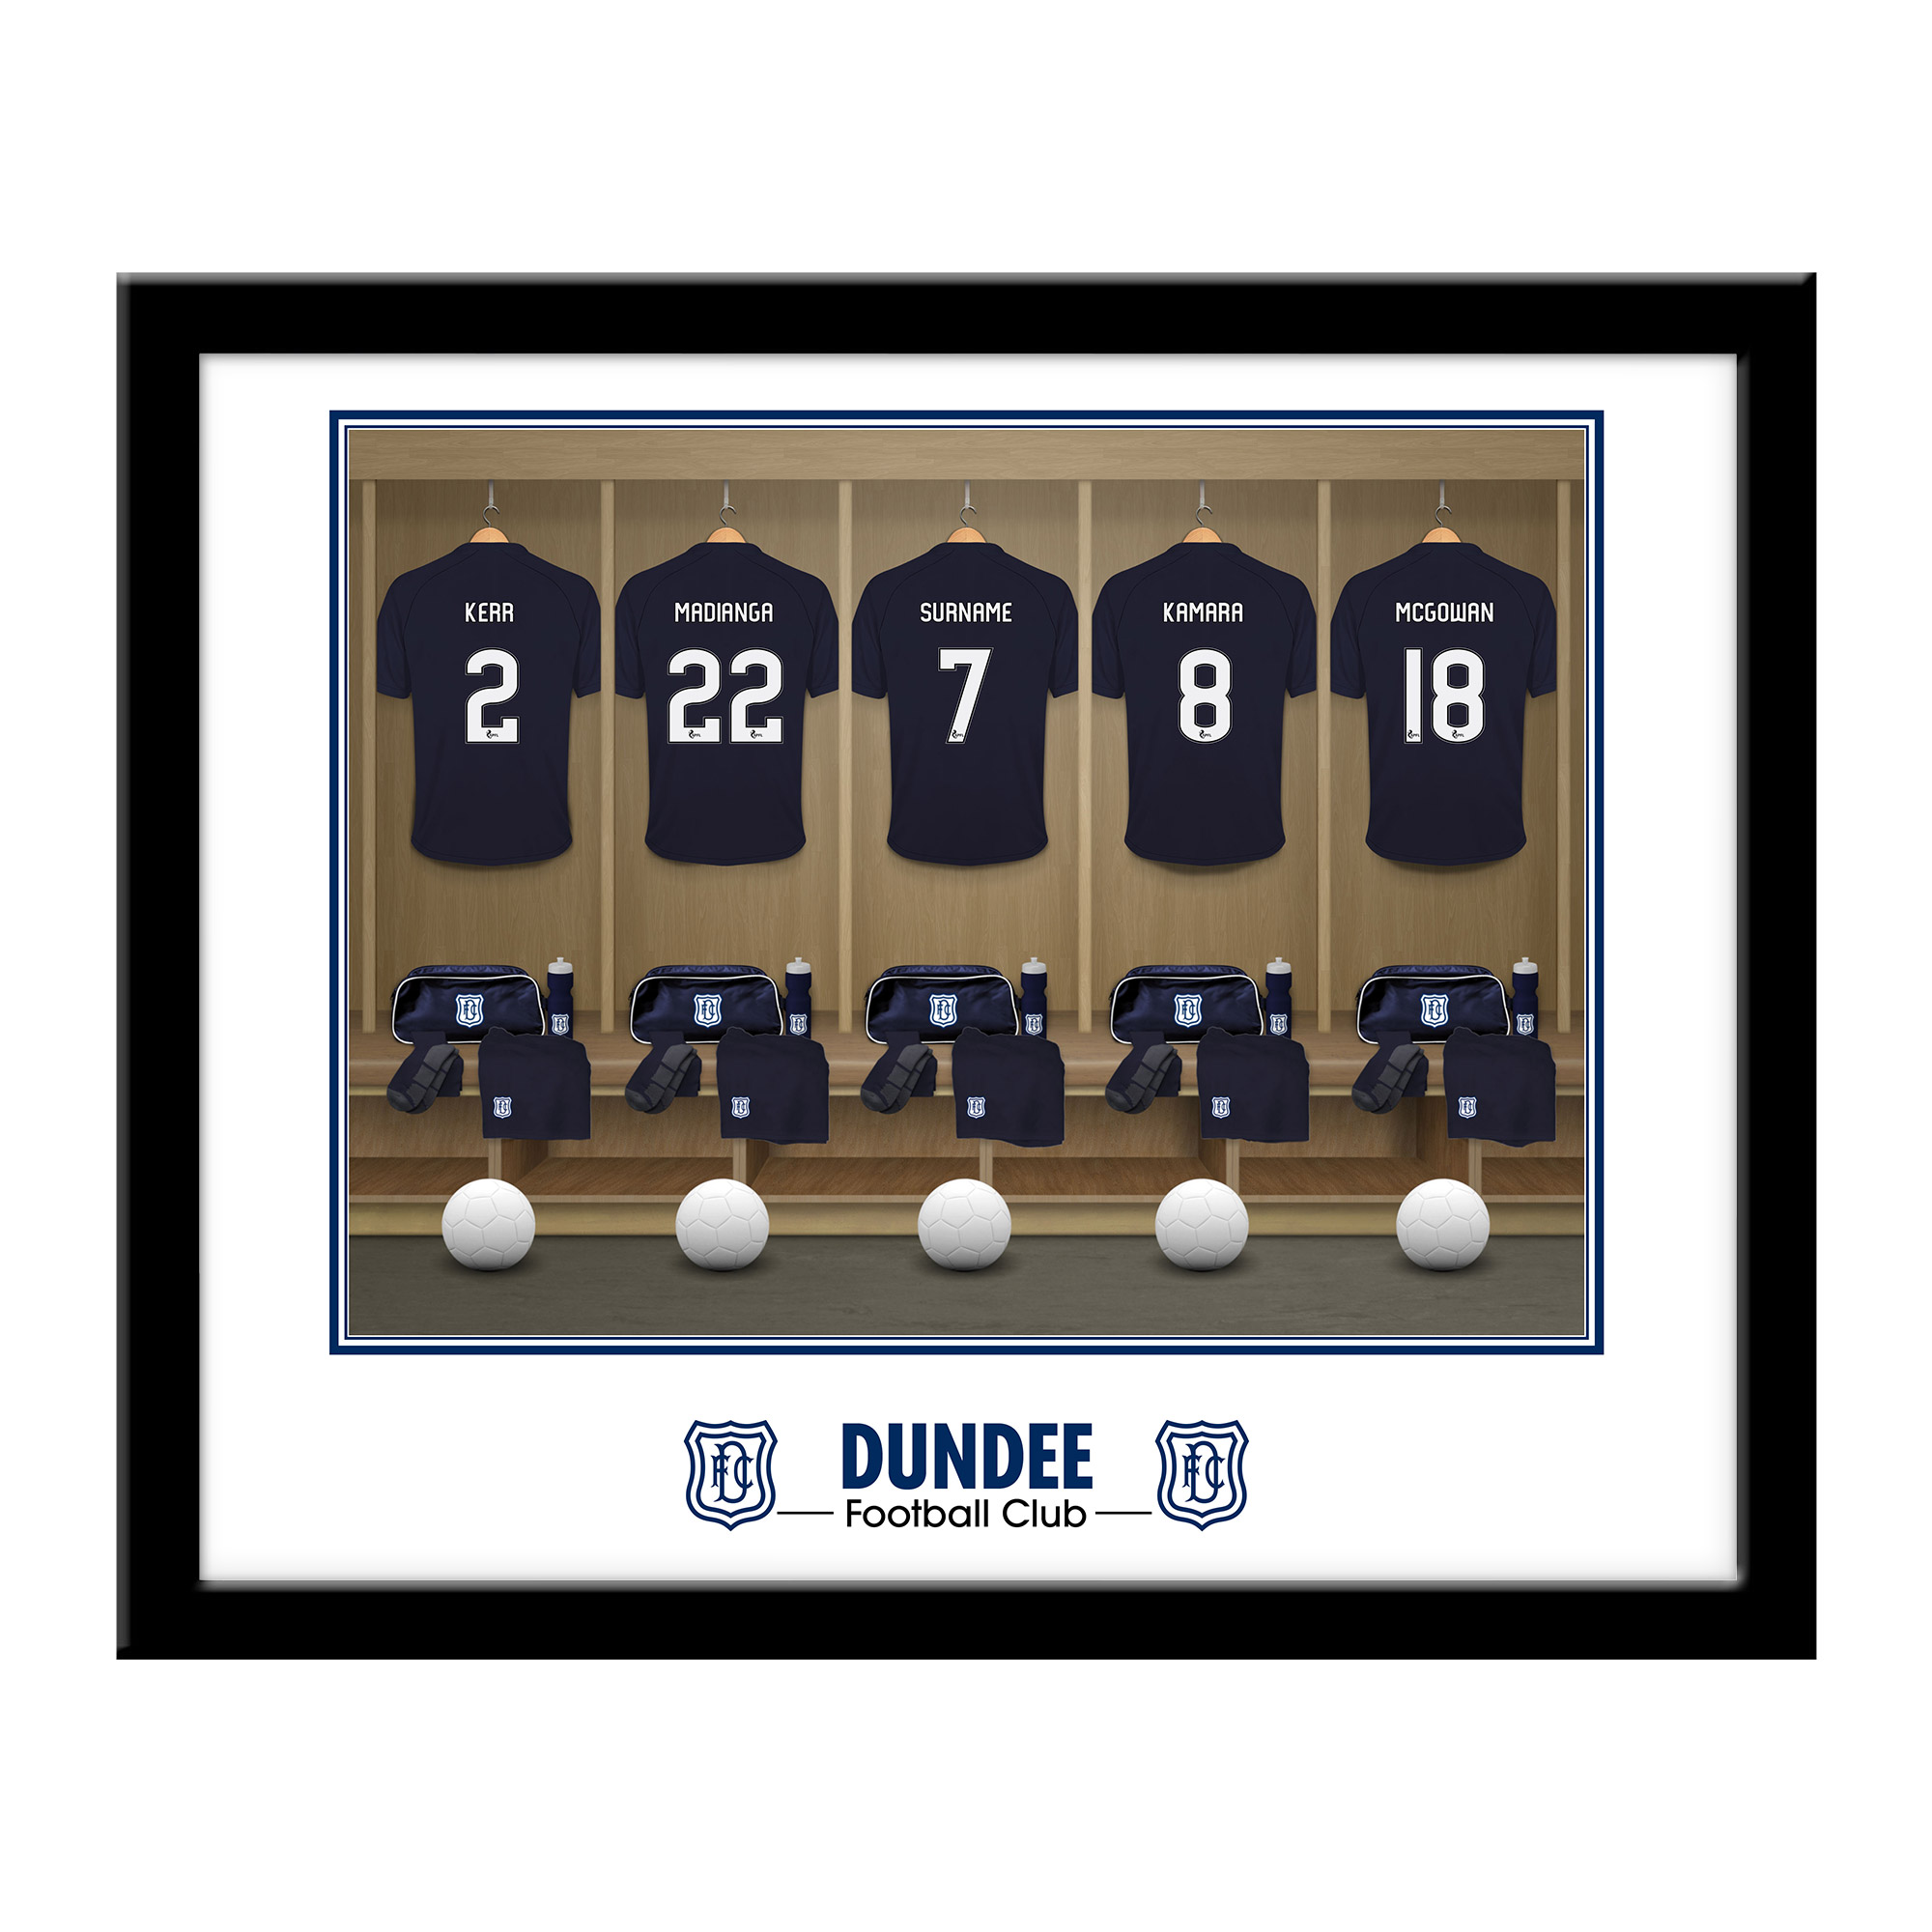 Dundee FC Dressing Room Framed Print